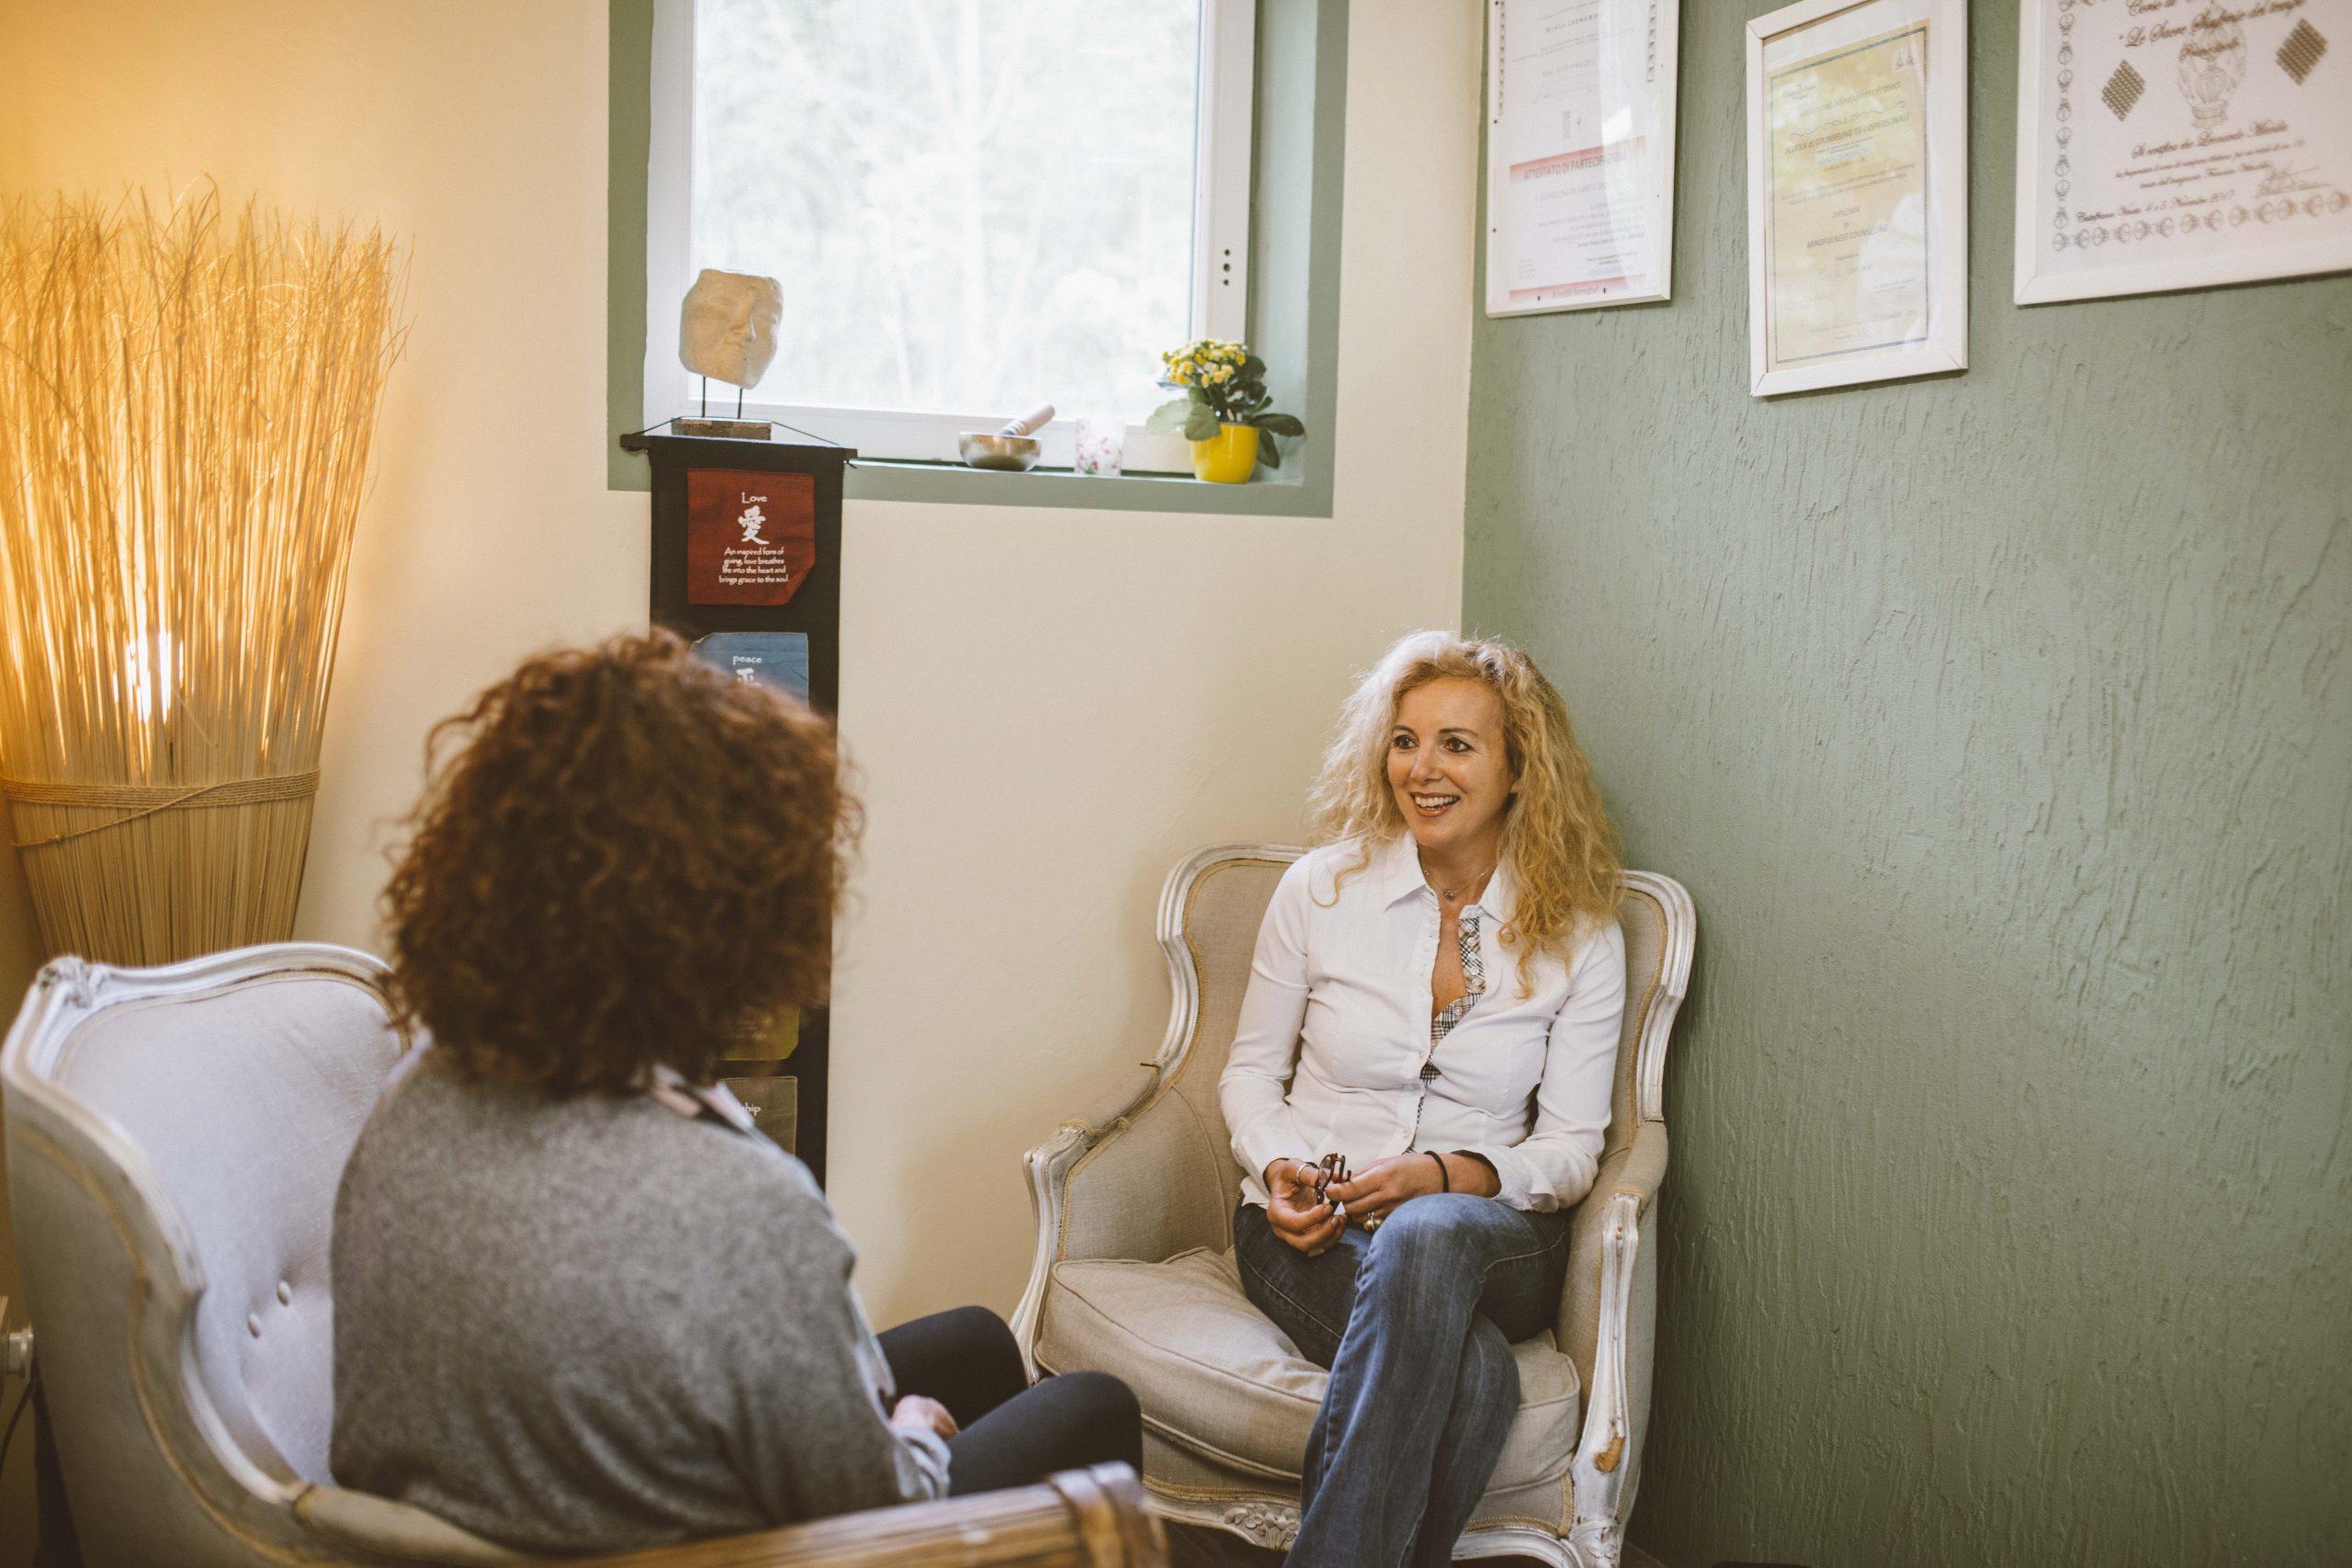 Manila Leonardo – Mindfulness Counselor